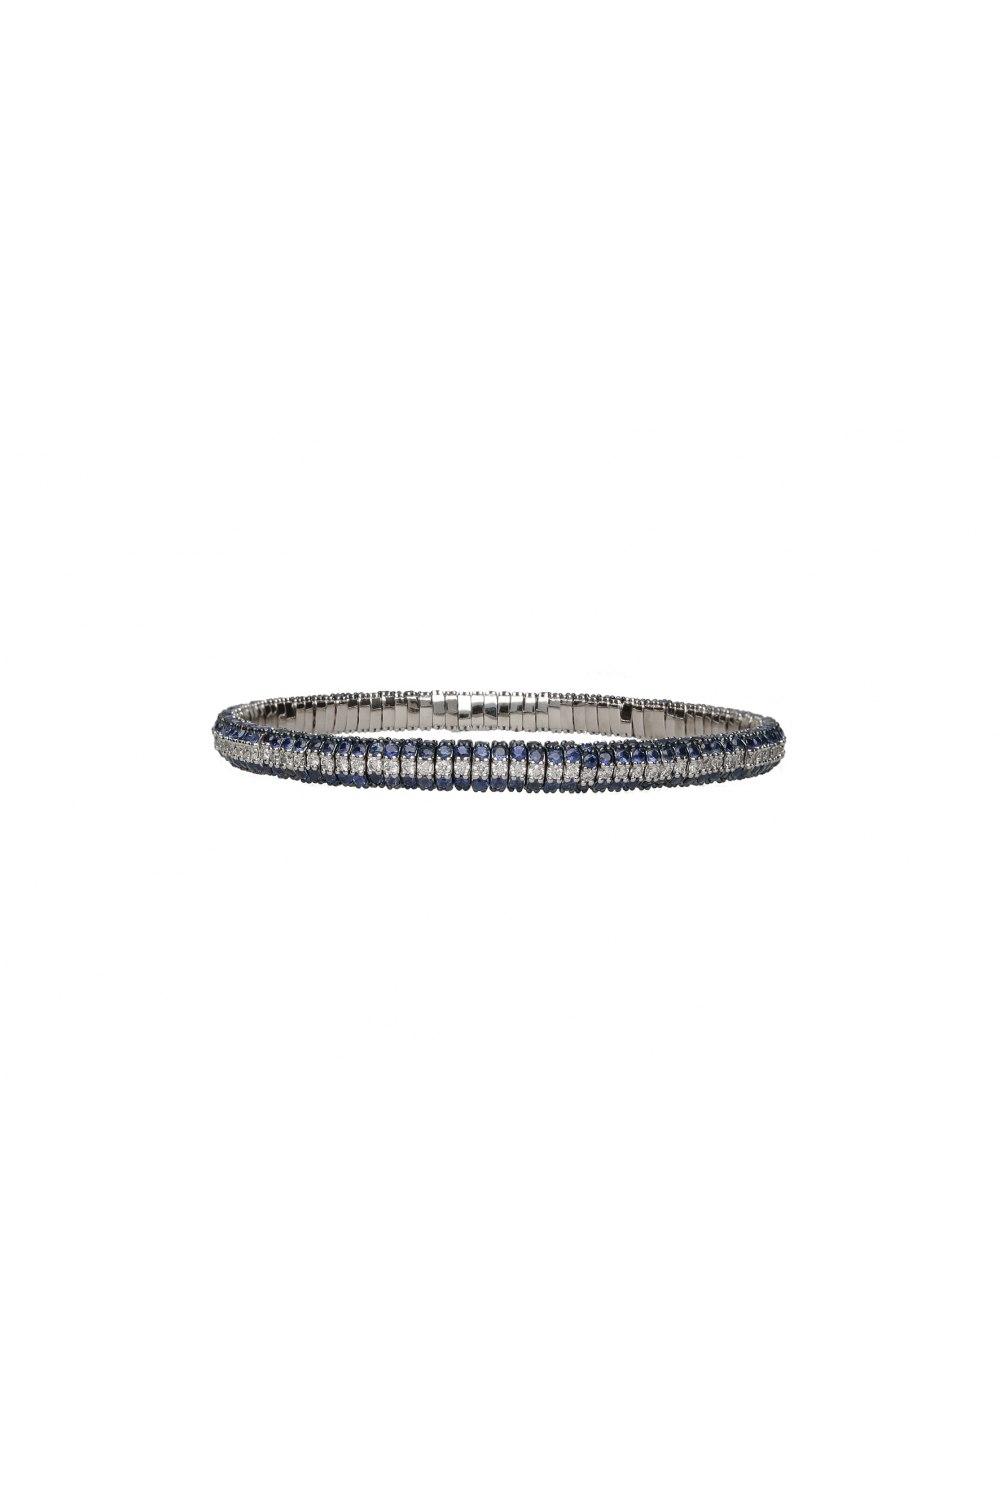 Giotto extra small bracelet